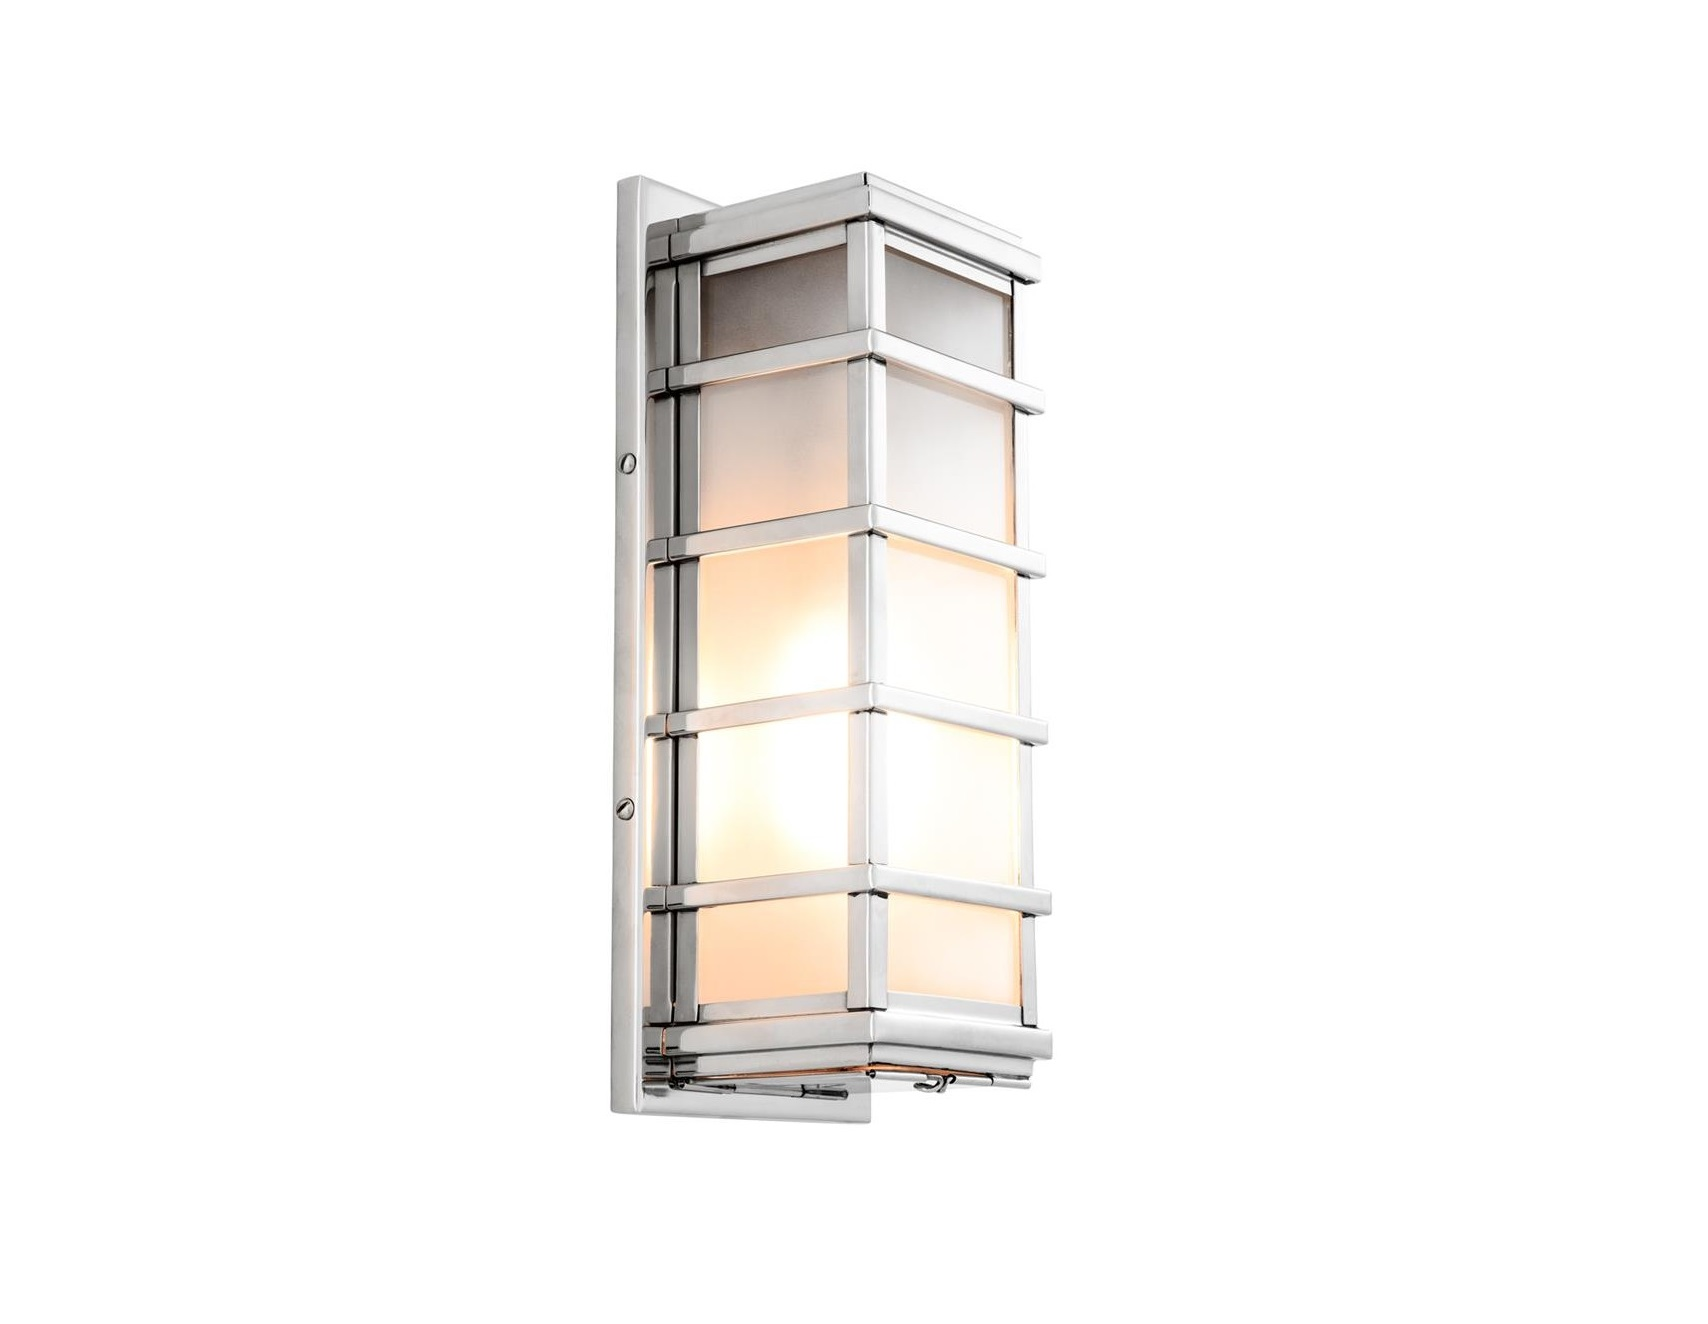 Настенный светильник WelbyБра<br>&amp;lt;div&amp;gt;Вид цоколя: E14&amp;lt;/div&amp;gt;&amp;lt;div&amp;gt;Мощность: &amp;amp;nbsp;40W&amp;amp;nbsp;&amp;lt;/div&amp;gt;&amp;lt;div&amp;gt;Количество ламп: 1 (нет в комплекте)&amp;lt;/div&amp;gt;<br><br>Material: Металл<br>Ширина см: 12.0<br>Высота см: 29.0<br>Глубина см: 9.0